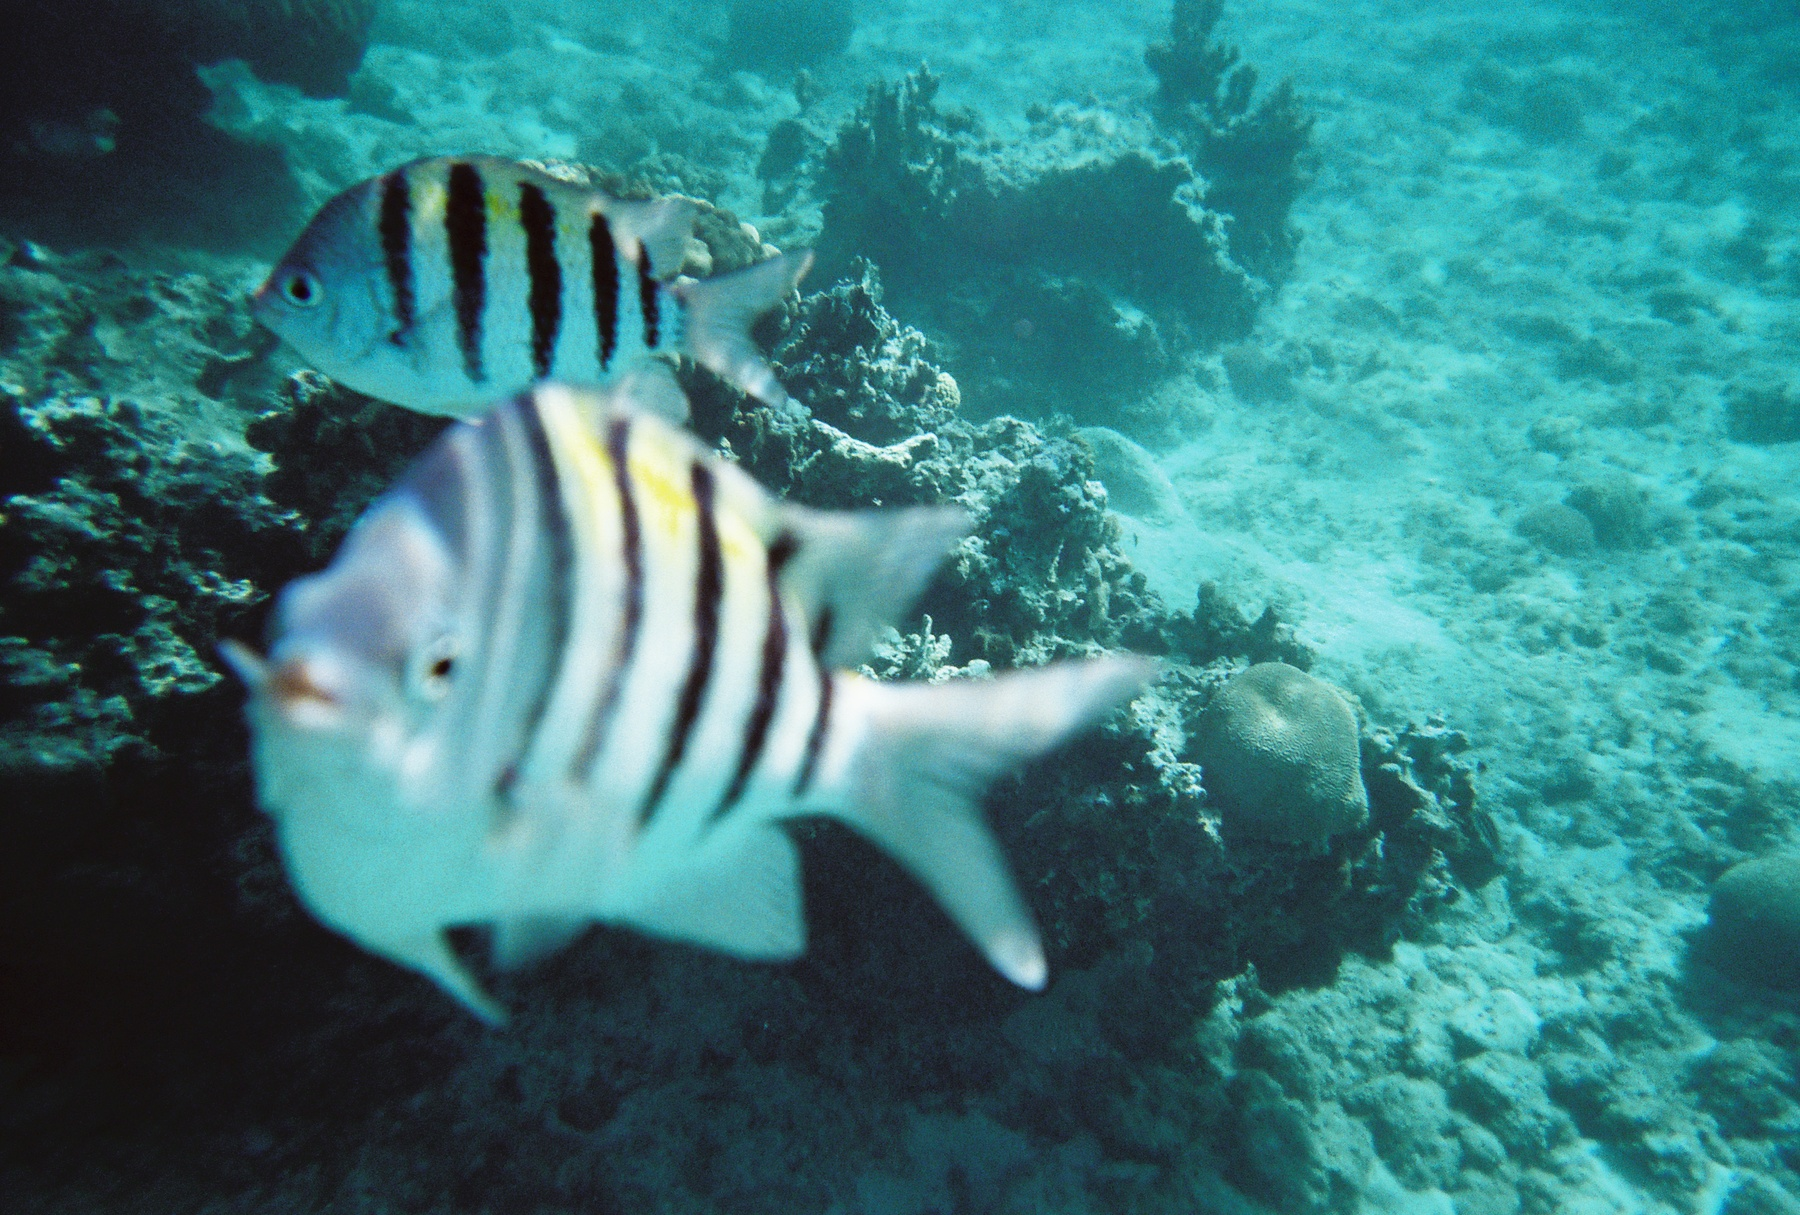 Black And White Striped Fish